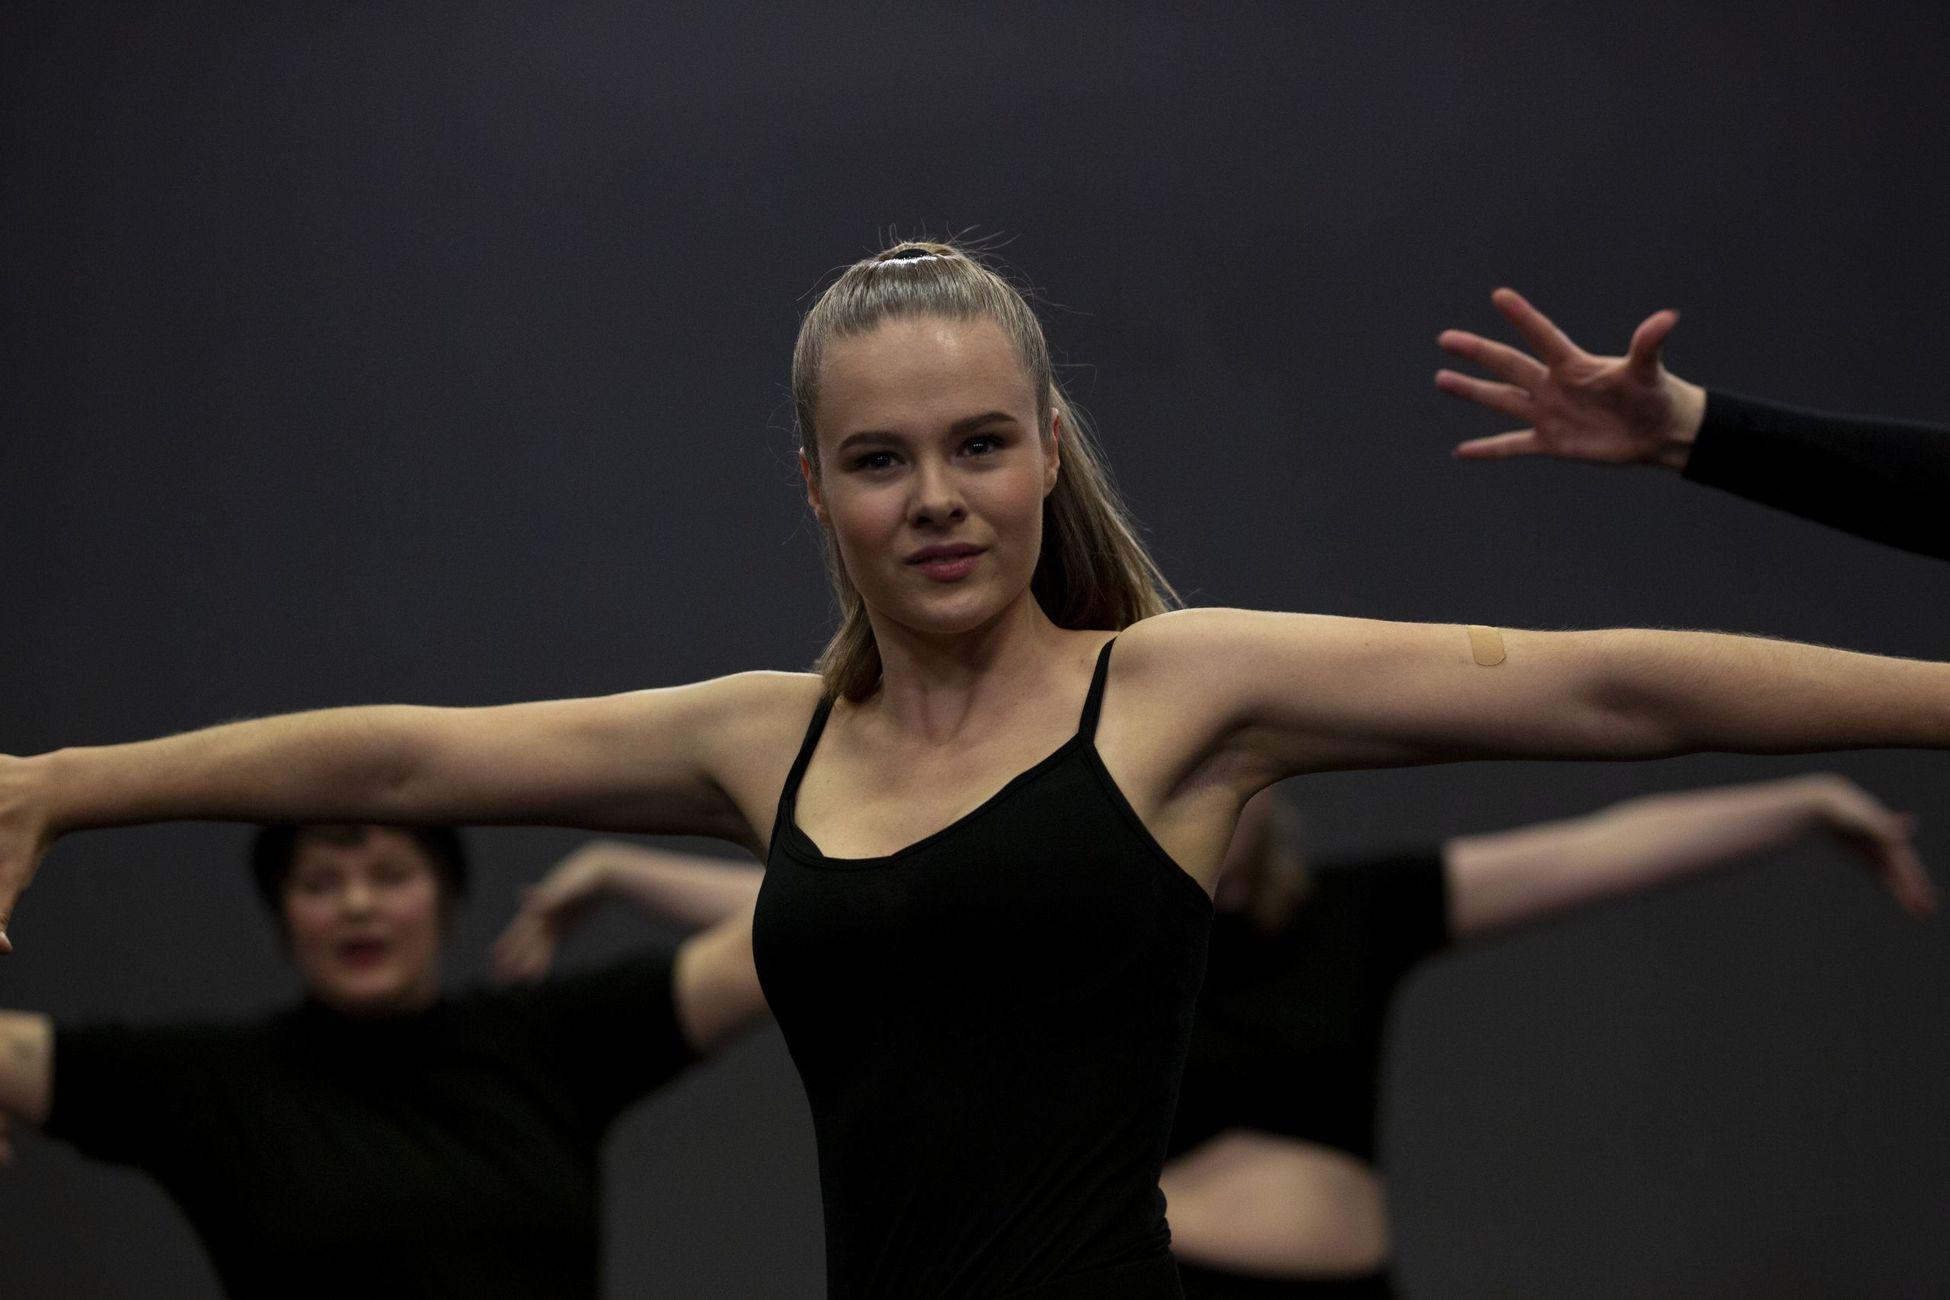 Danselinje på Solbakken folkehøgskole